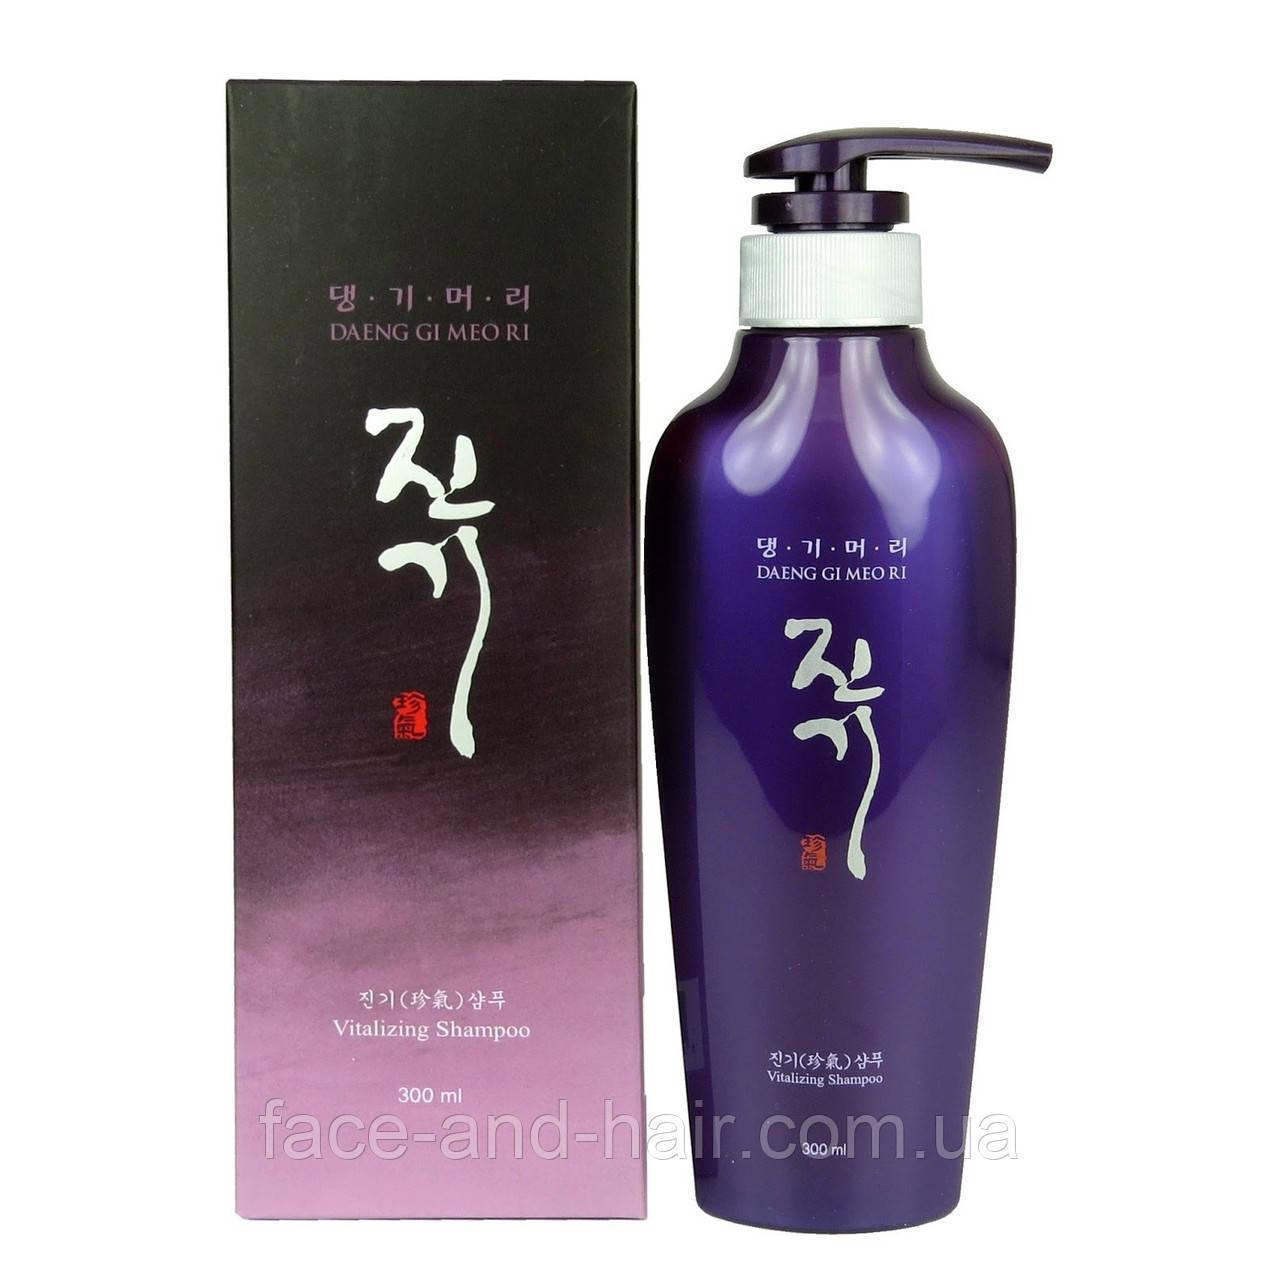 Регенерирующий шампунь для волос Daeng Gi Meo Ri Vitalizing Shampoo, 300 мл